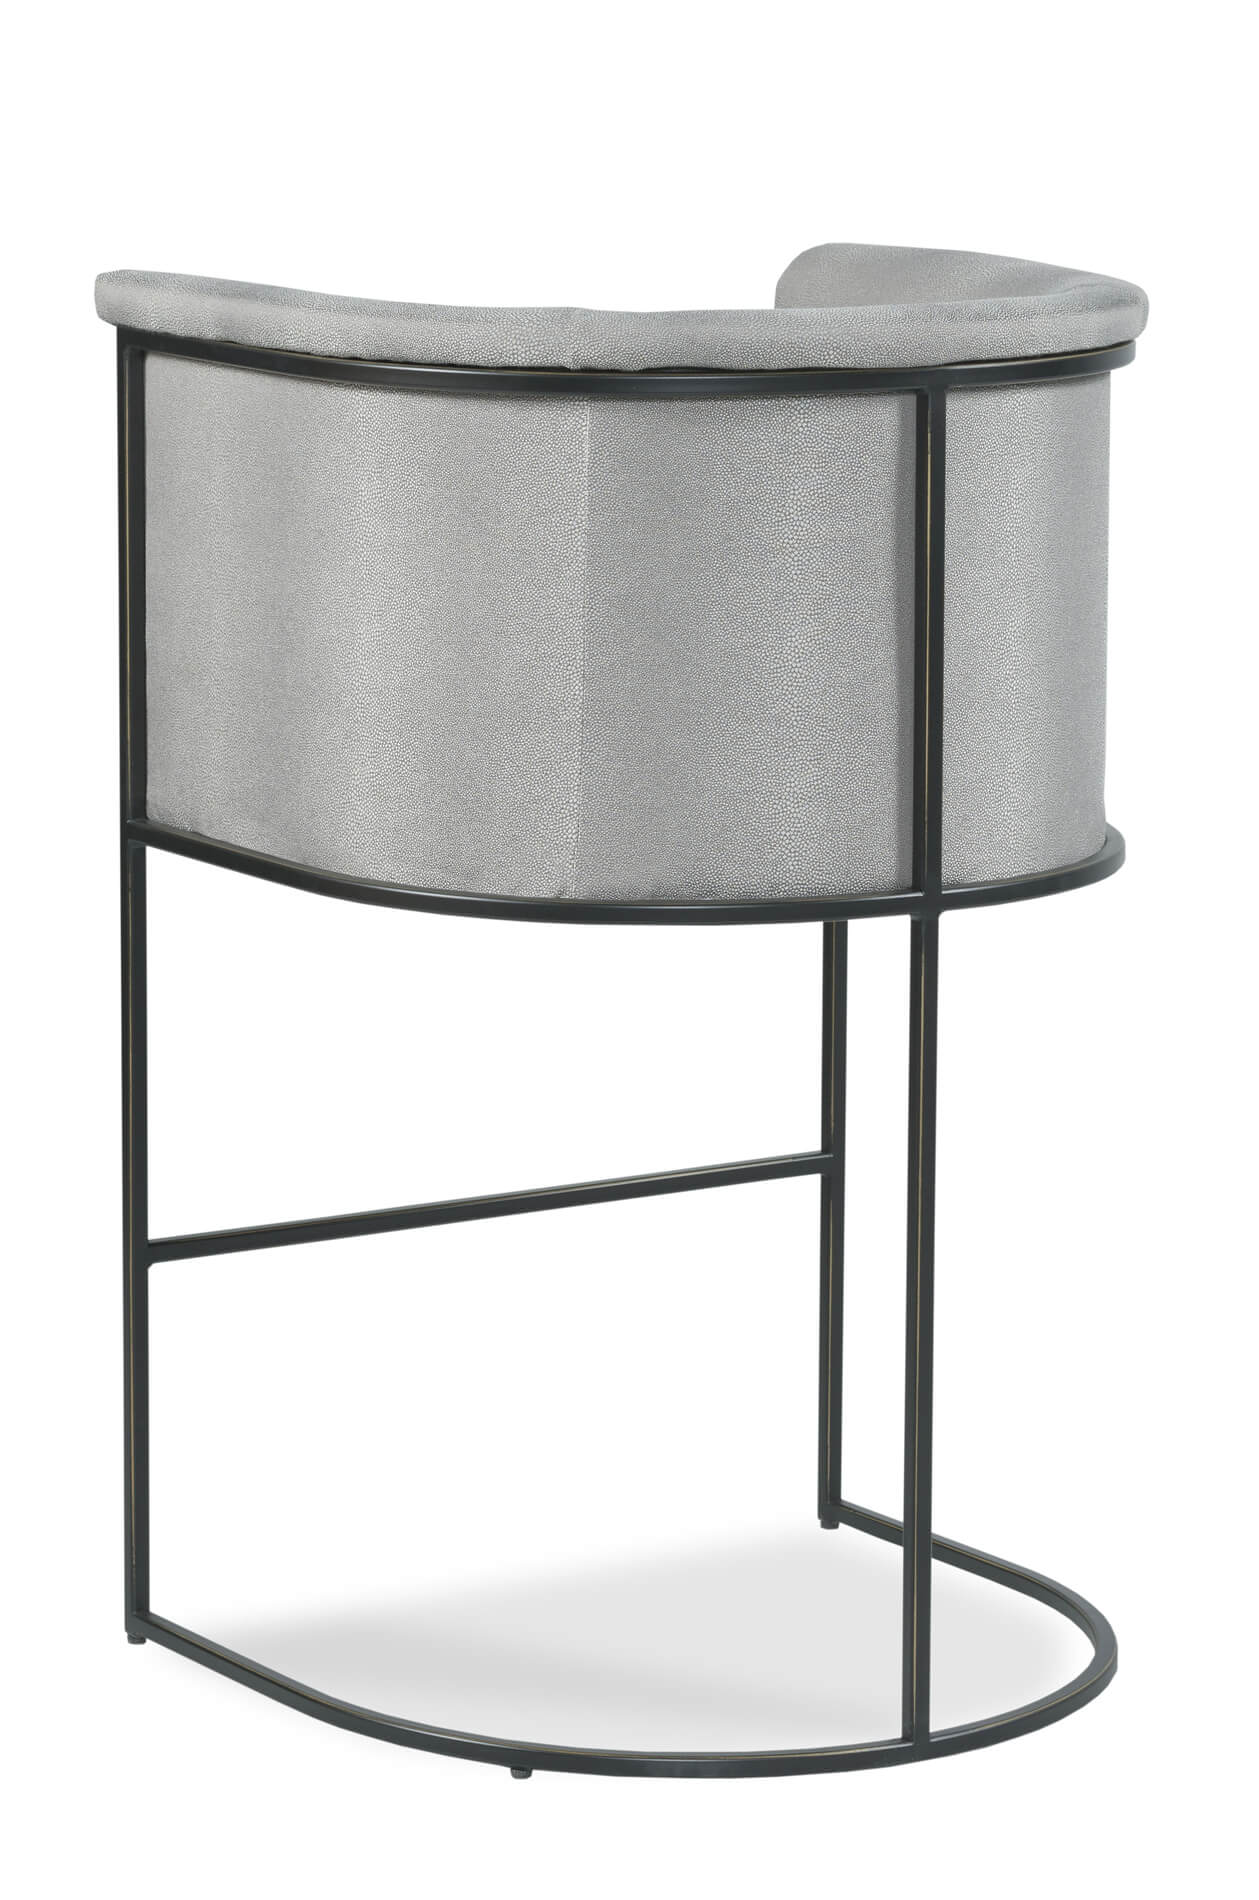 Prime Nolita Modern Curved Barrel Counter Stool Ncnpc Chair Design For Home Ncnpcorg